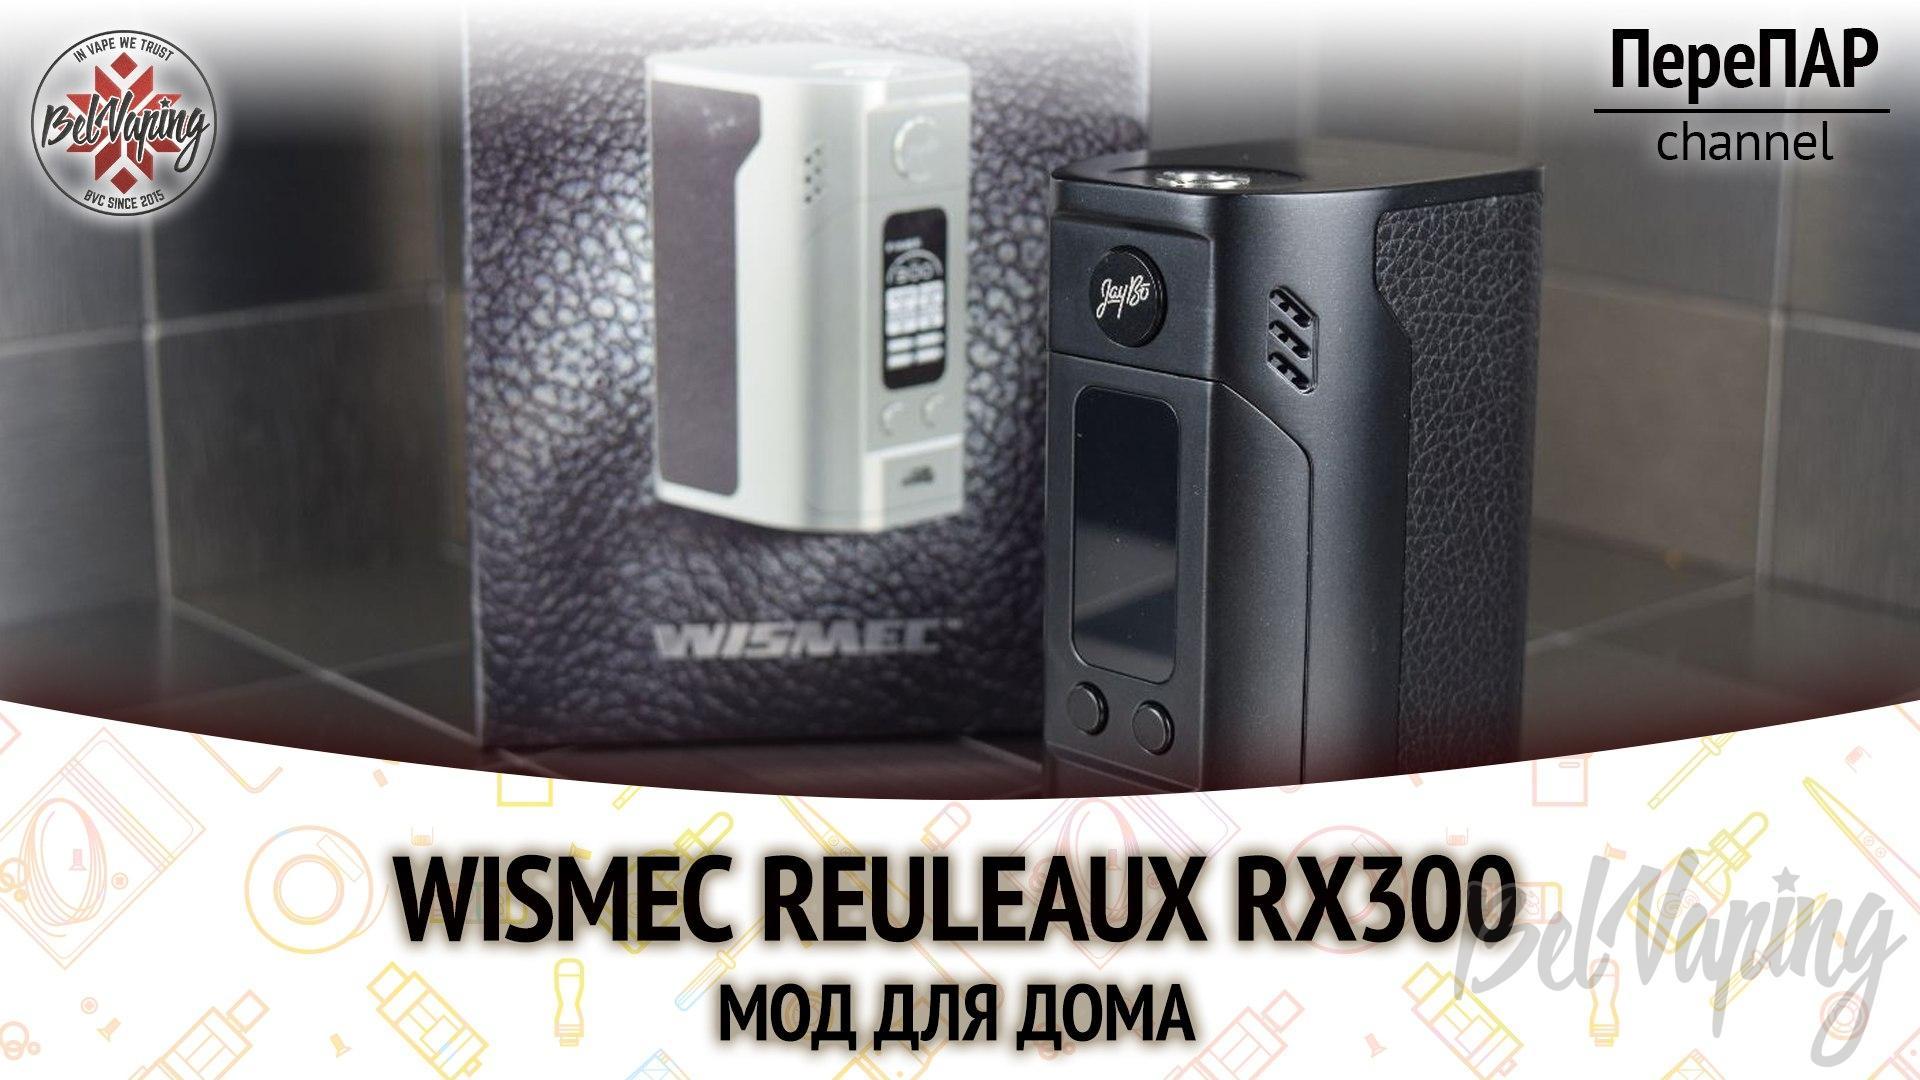 Обзор боксмода Wismec Reuleaux RX300